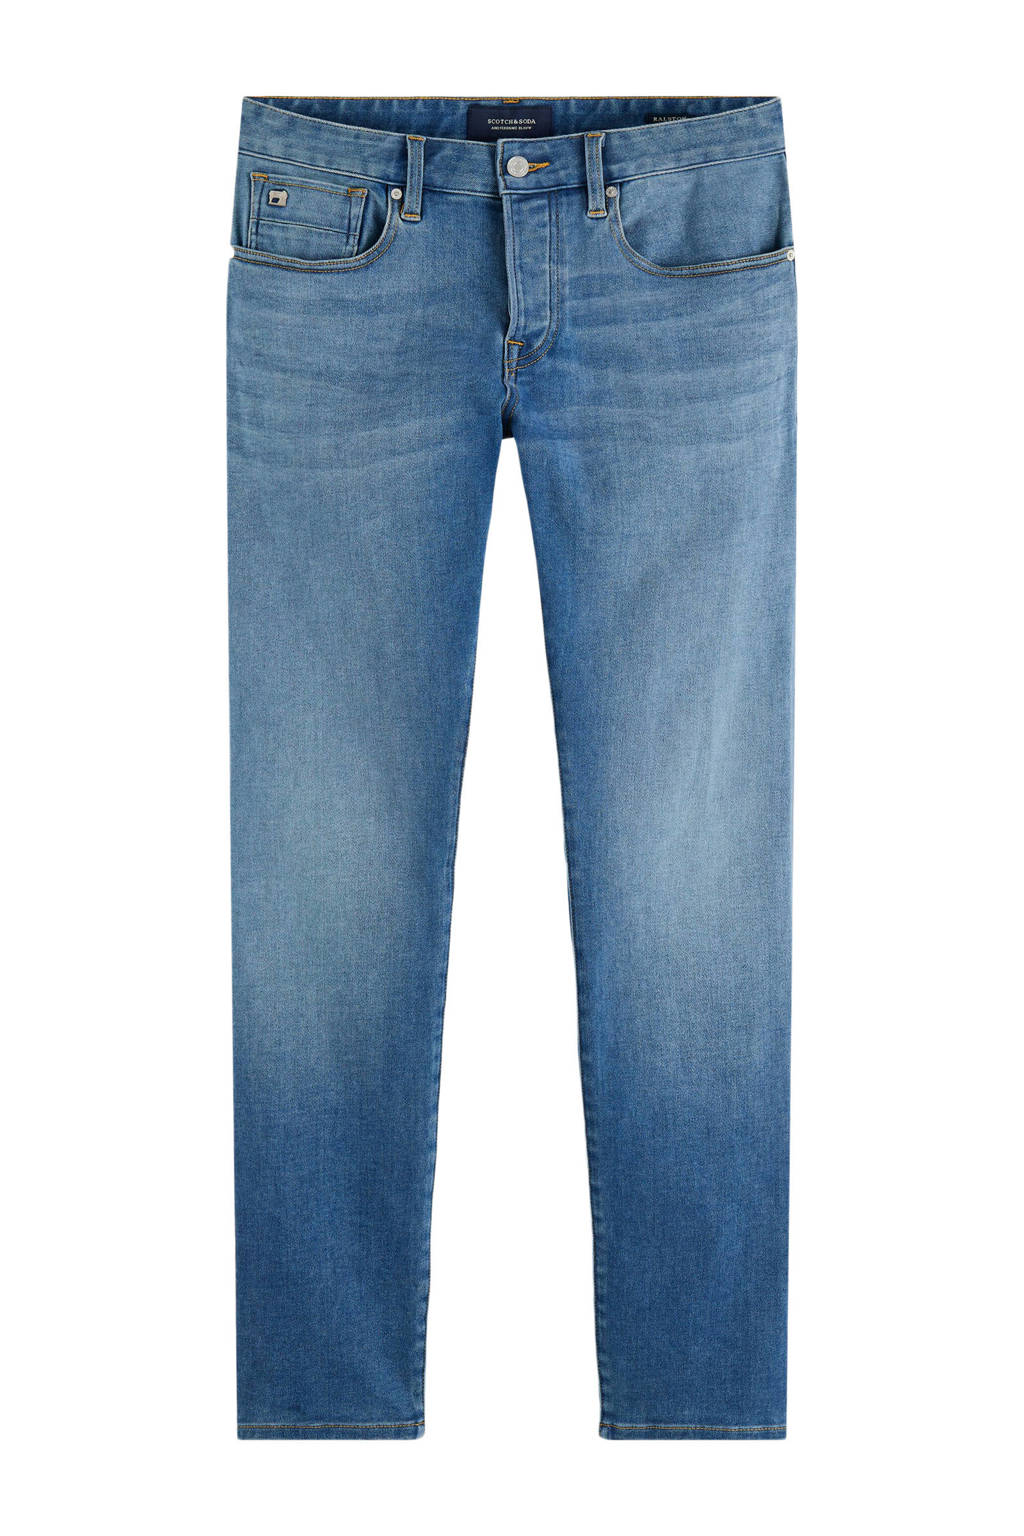 Scotch & Soda slim fit jeans Ralston spyglass light, Spyglass Light